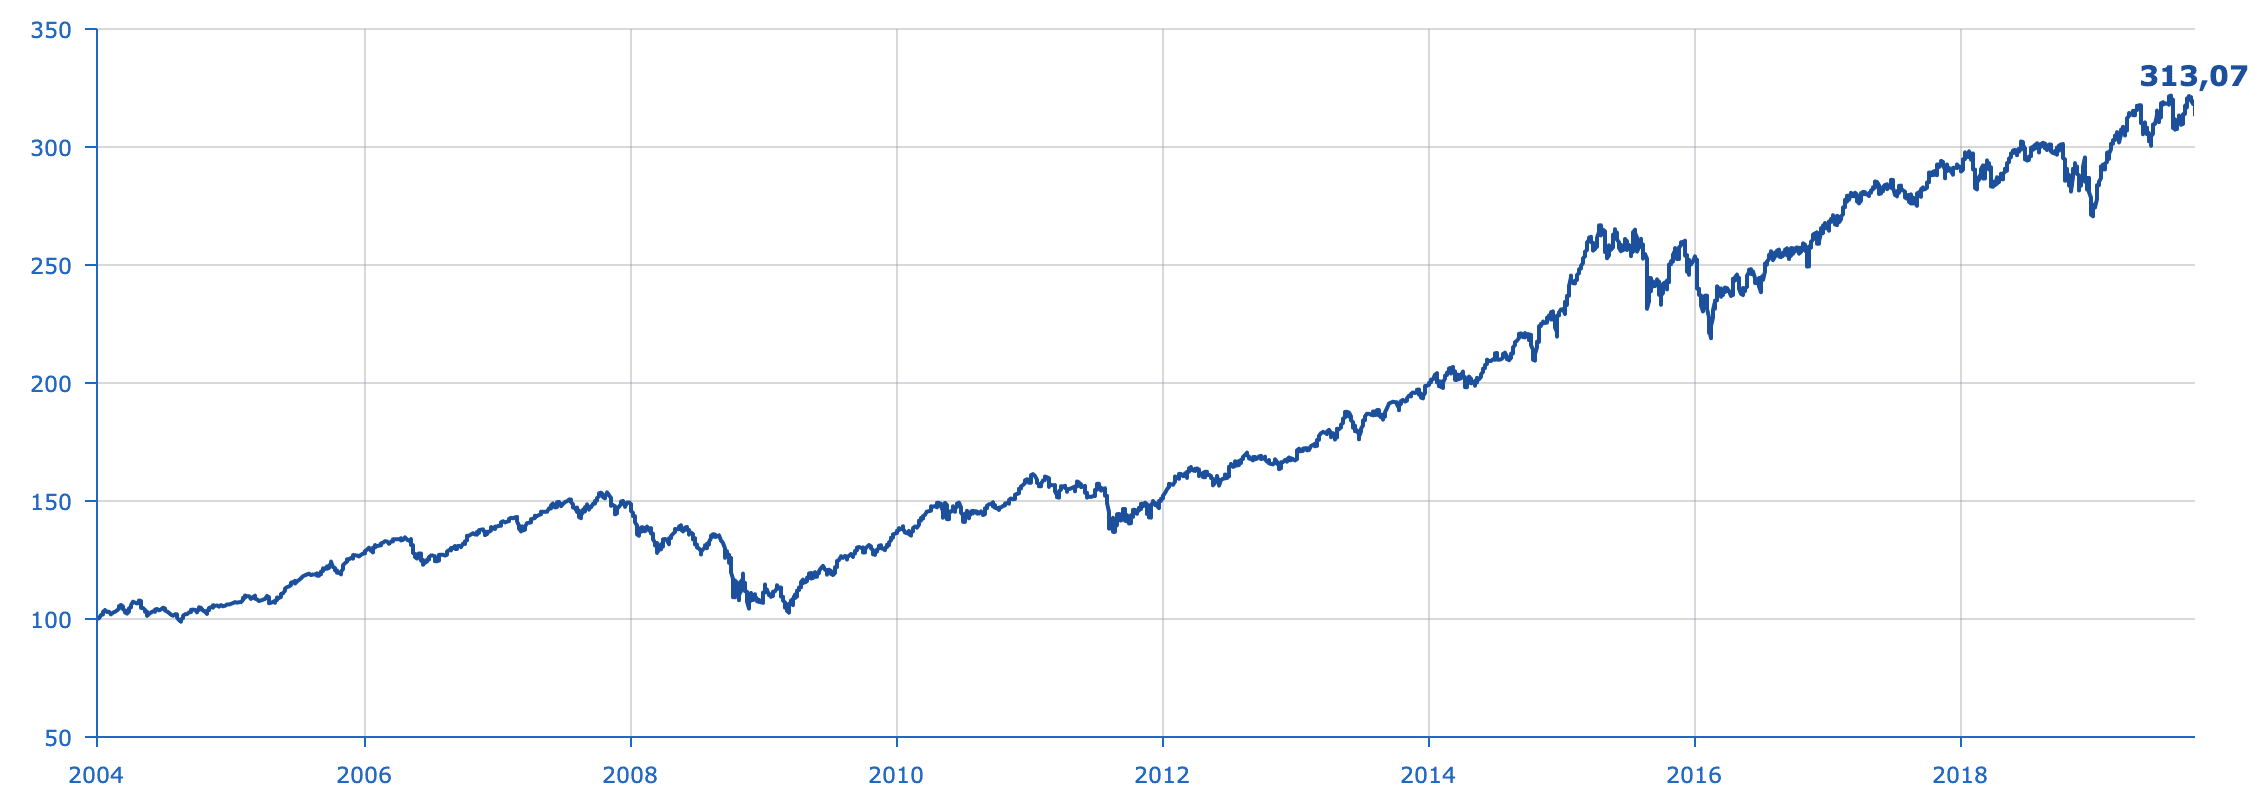 portefeuille majoritairement investi en UC